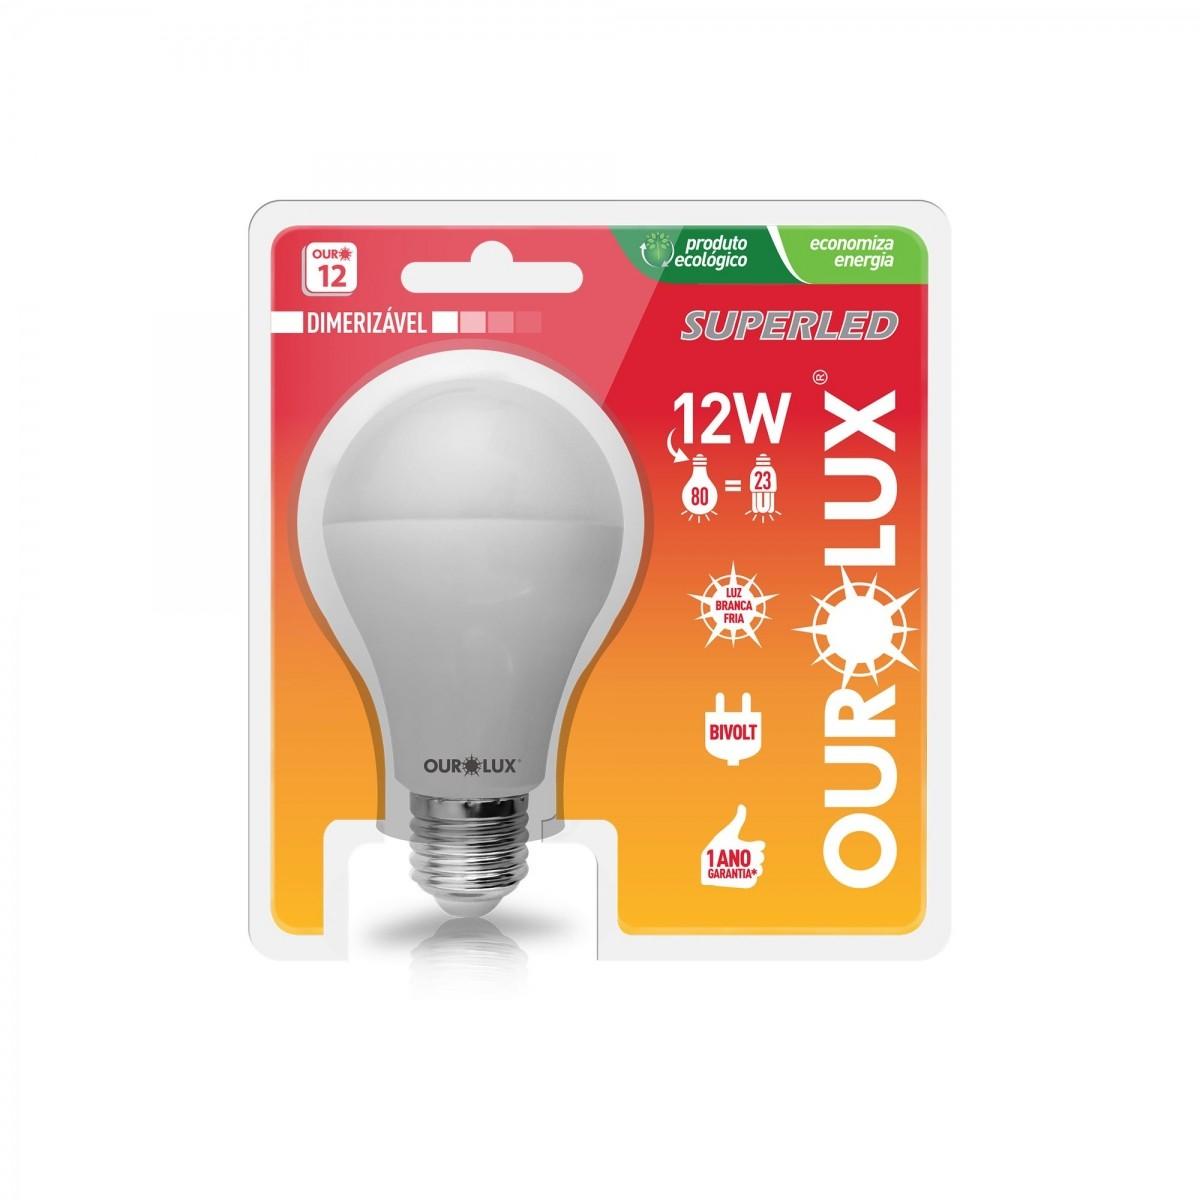 Lâmpada Bulbo LED Dimerizavel 12w Amarela - Ourolux